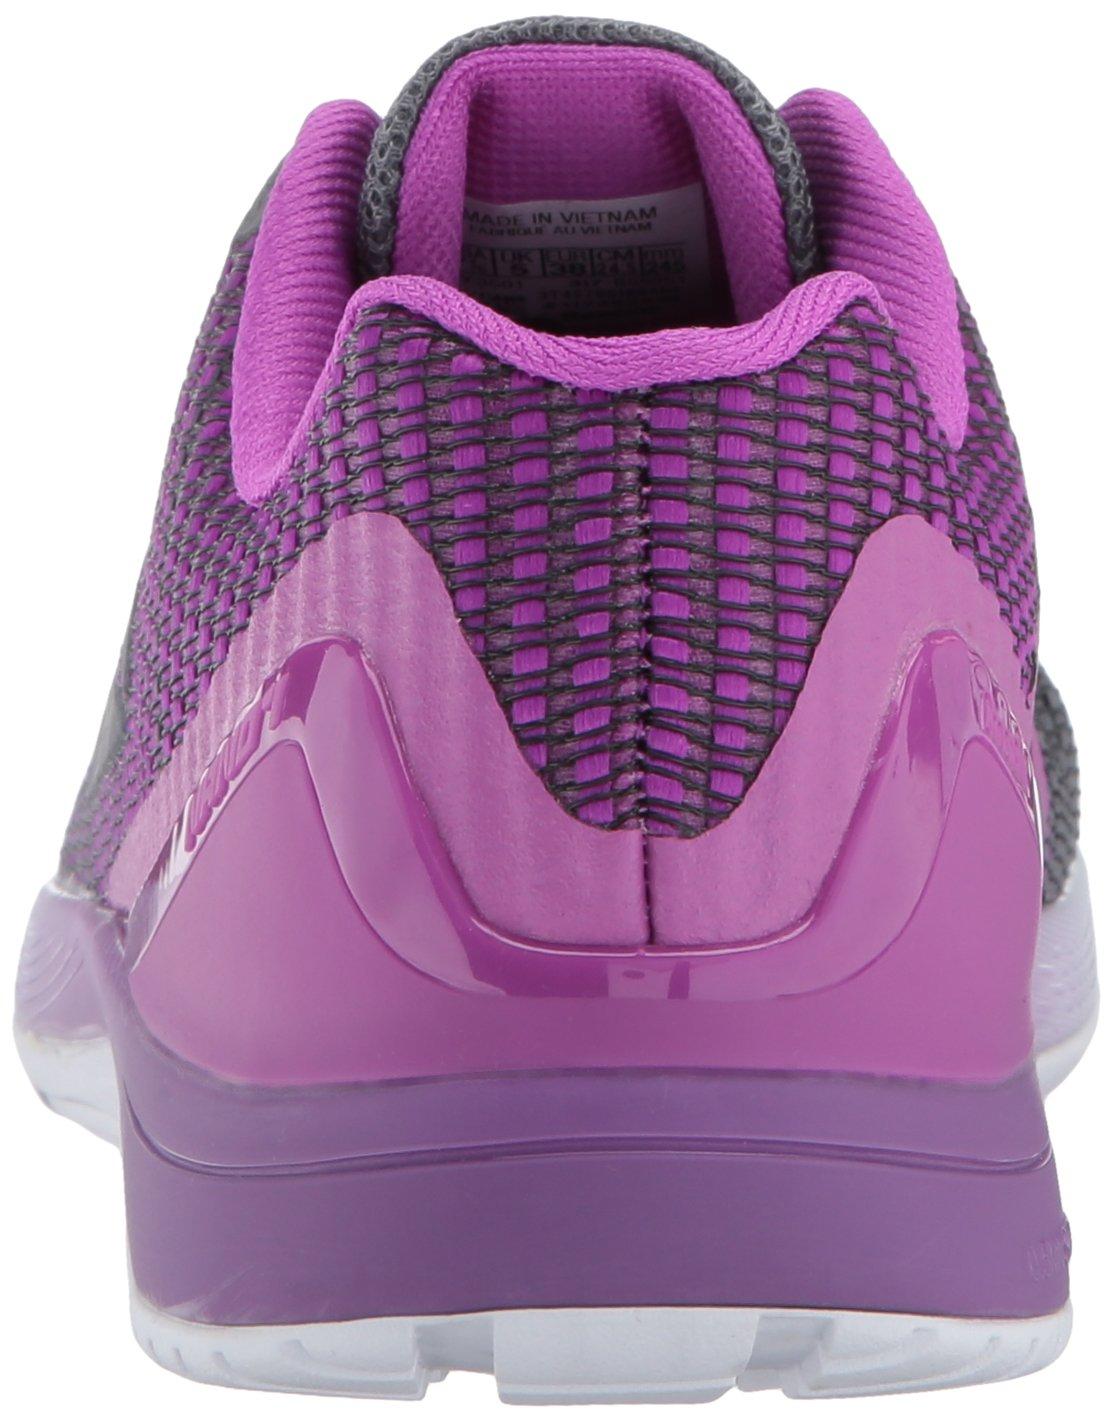 Reebok Women's Crossfit Nano 7.0 Track Shoe B01MZ6J2XV 8 B(M) US|Alloy/Vicious Violet/White